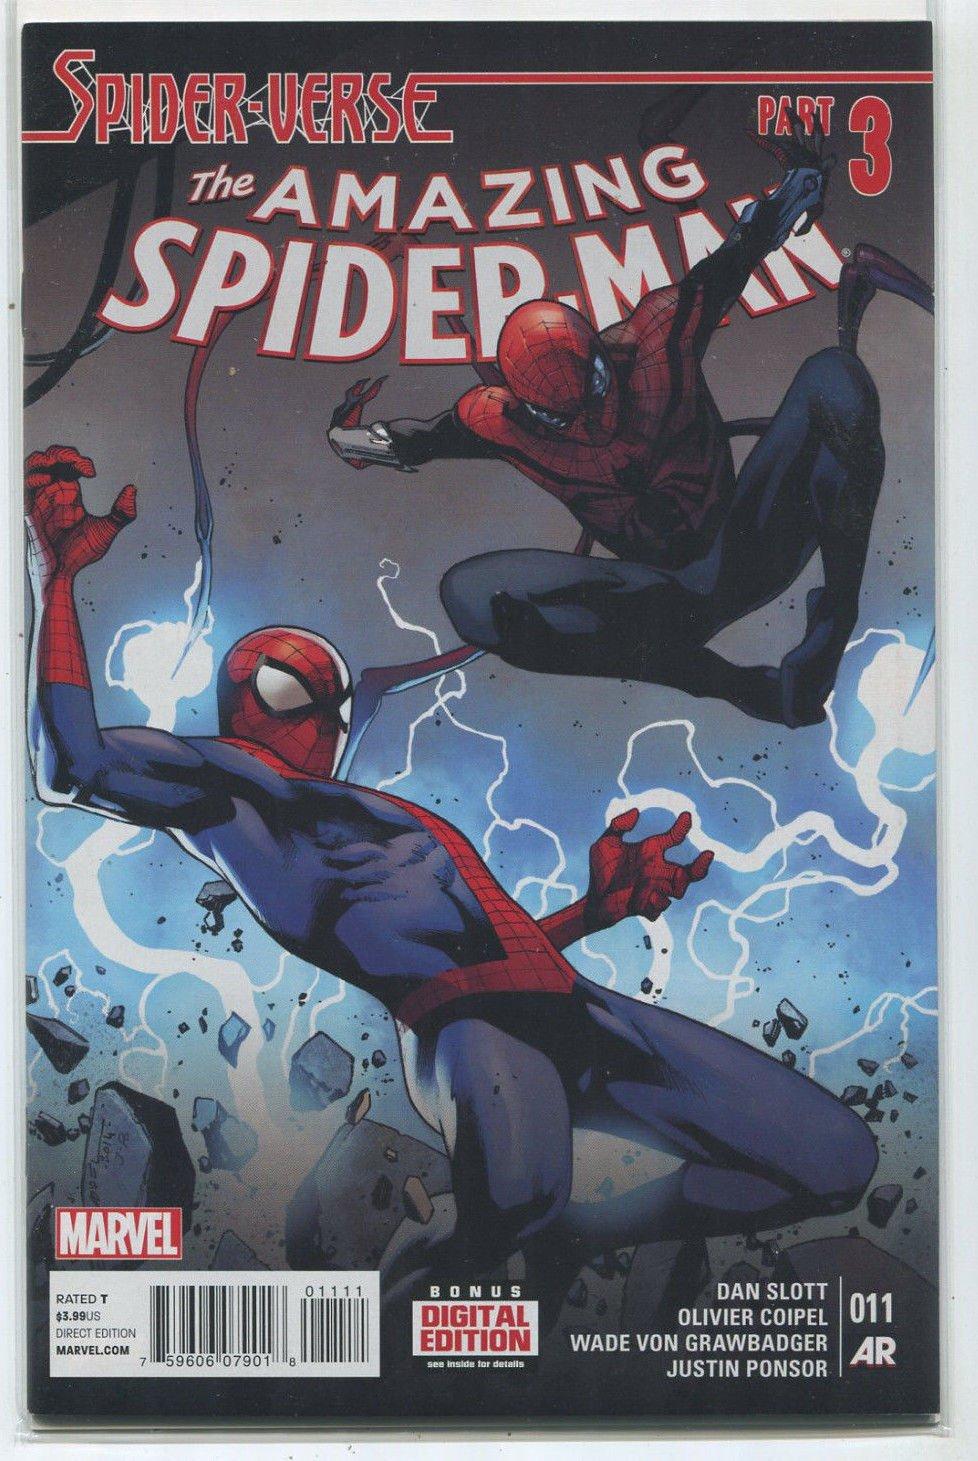 The Amazing Spider-Man Part 3 NM Spider-Verse Slott Coipel Marvel Comics X1